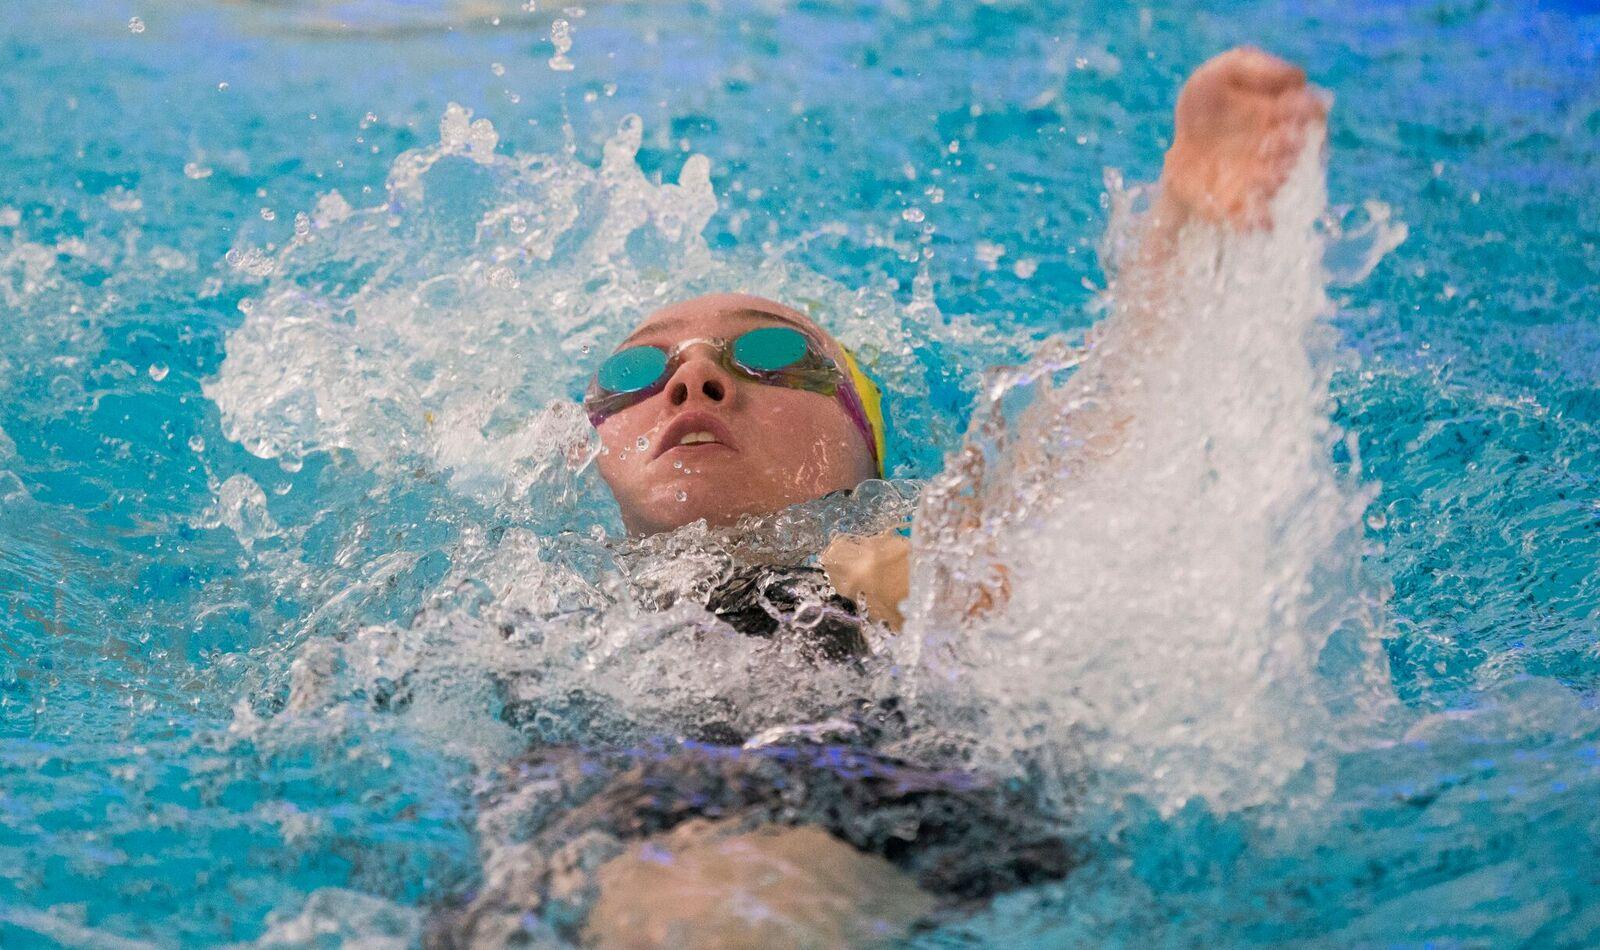 Mia Bottrill competing in a backstroke event.